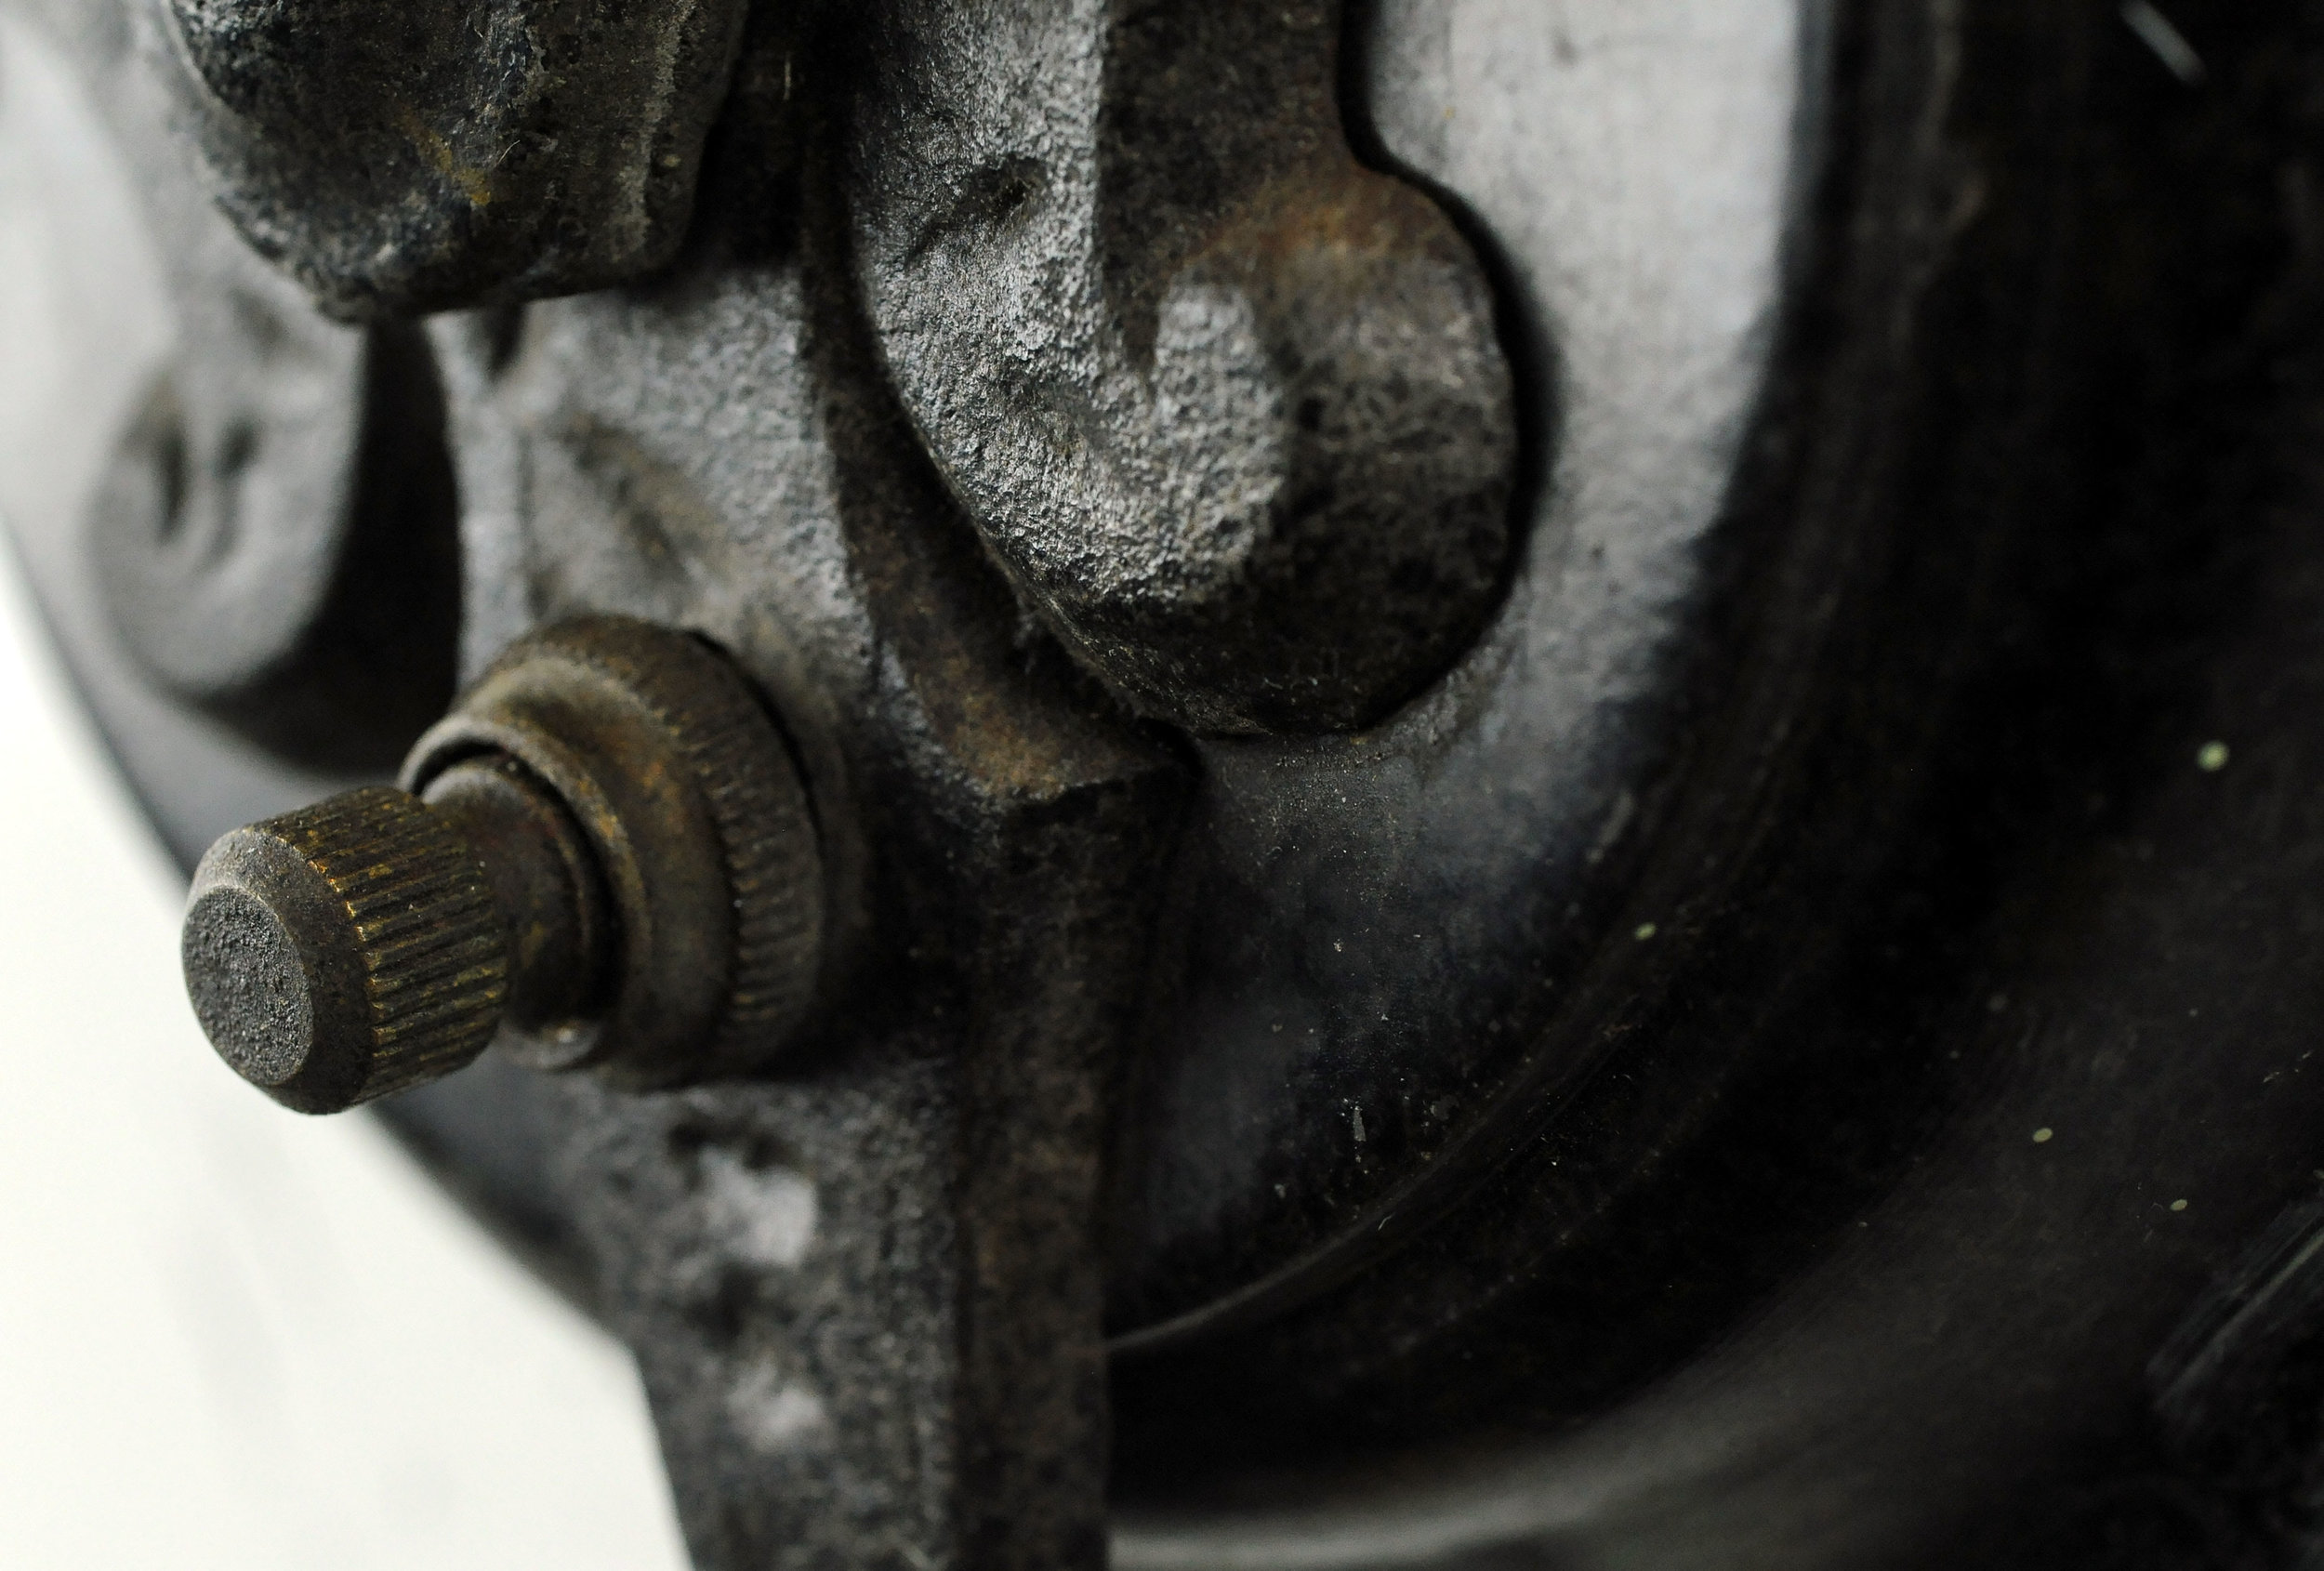 44742-one-arm-tudor-sconce-switch-detail.jpg